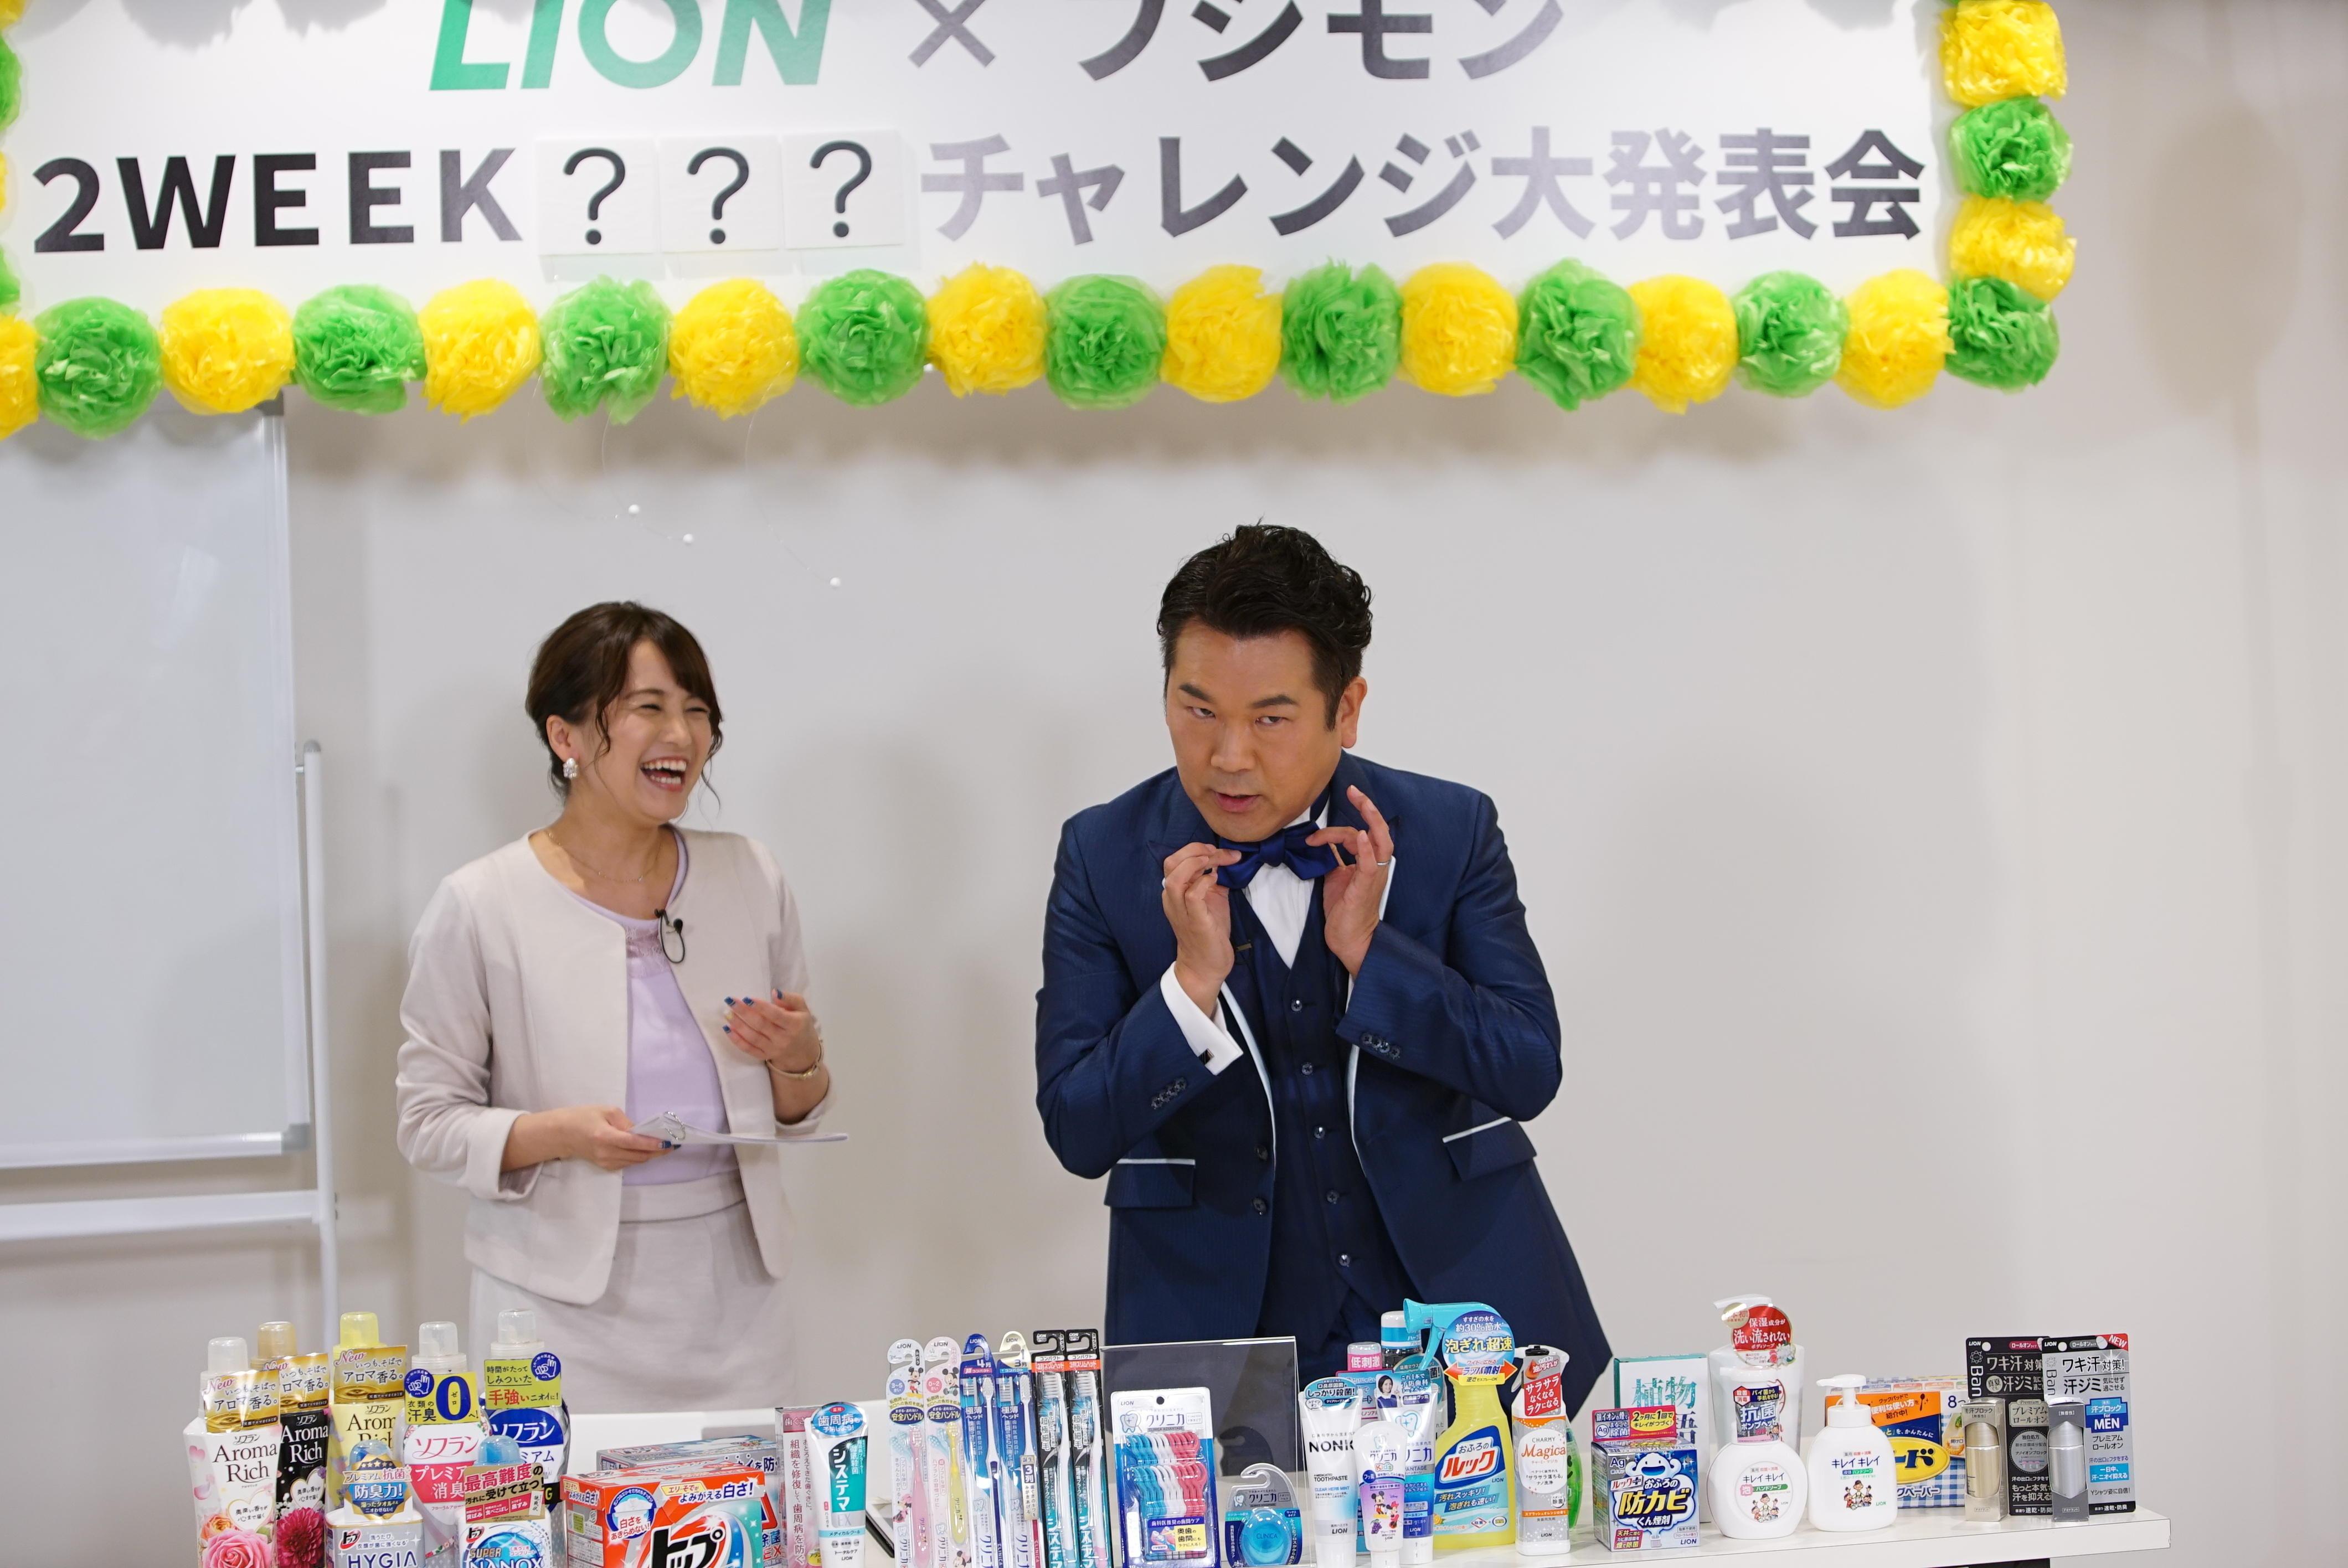 http://news.yoshimoto.co.jp/20180712103301-dc05cf6439ccfacbdef596194166f2111c34be10.jpg